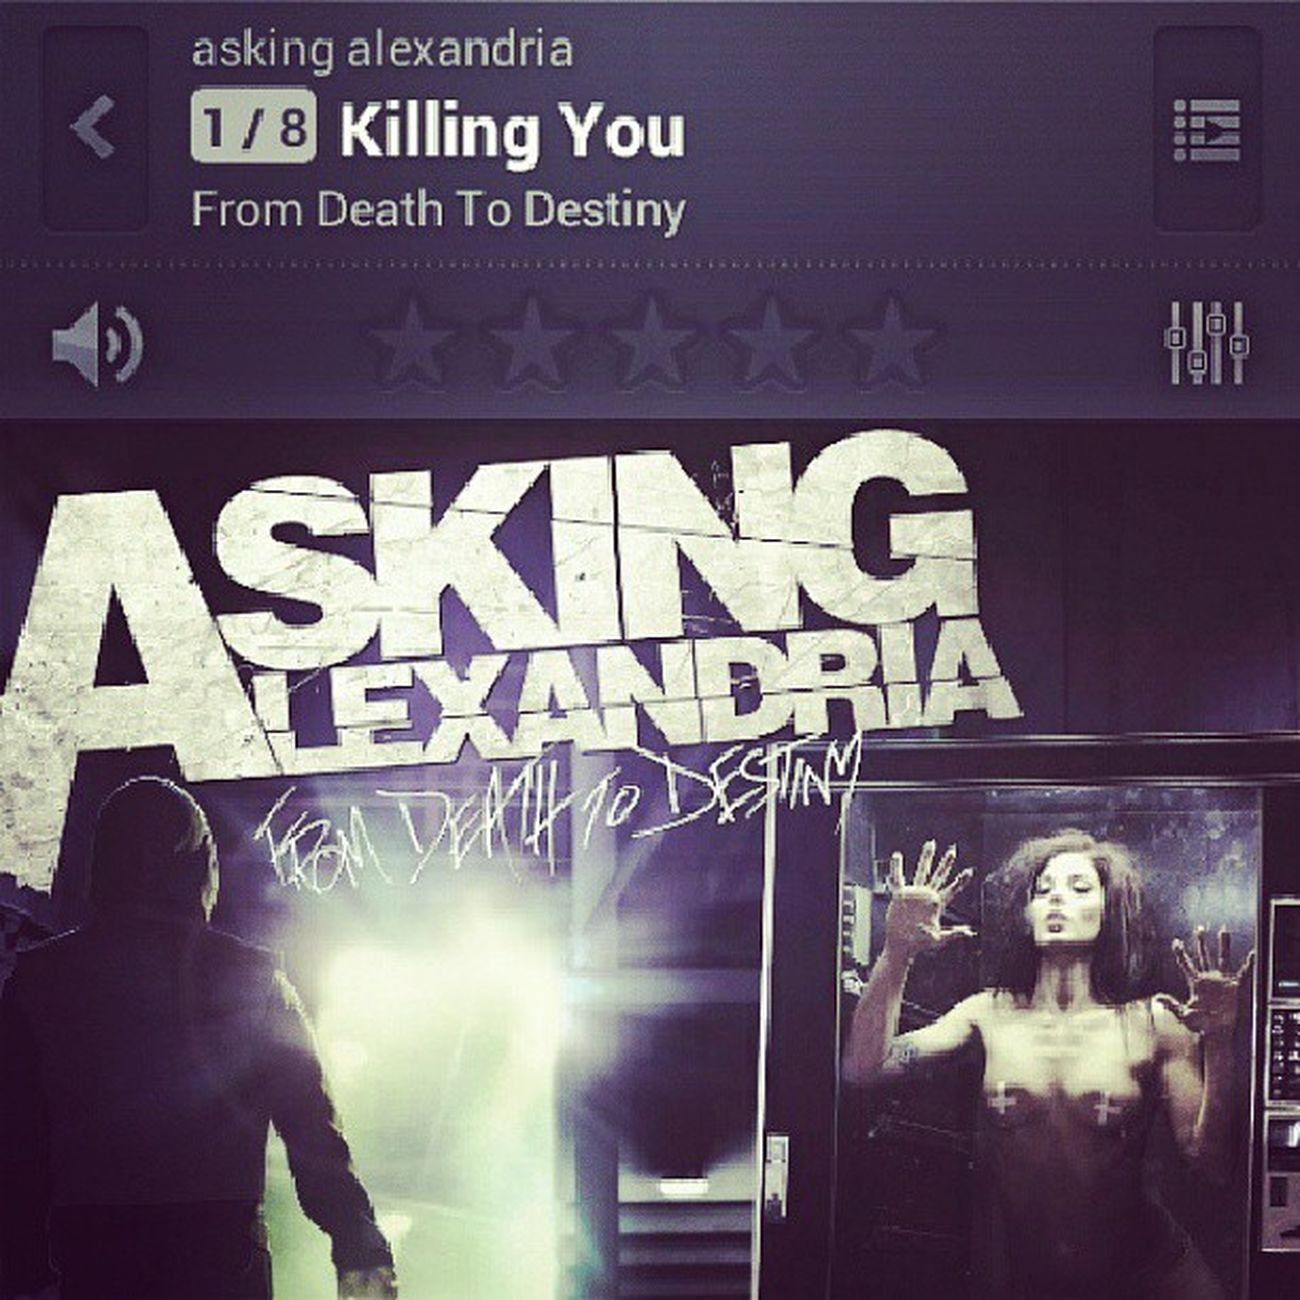 Alguien ya se pirateo el nuevo álbum de @askingalexandriaofficial Fromdeathtodestiny